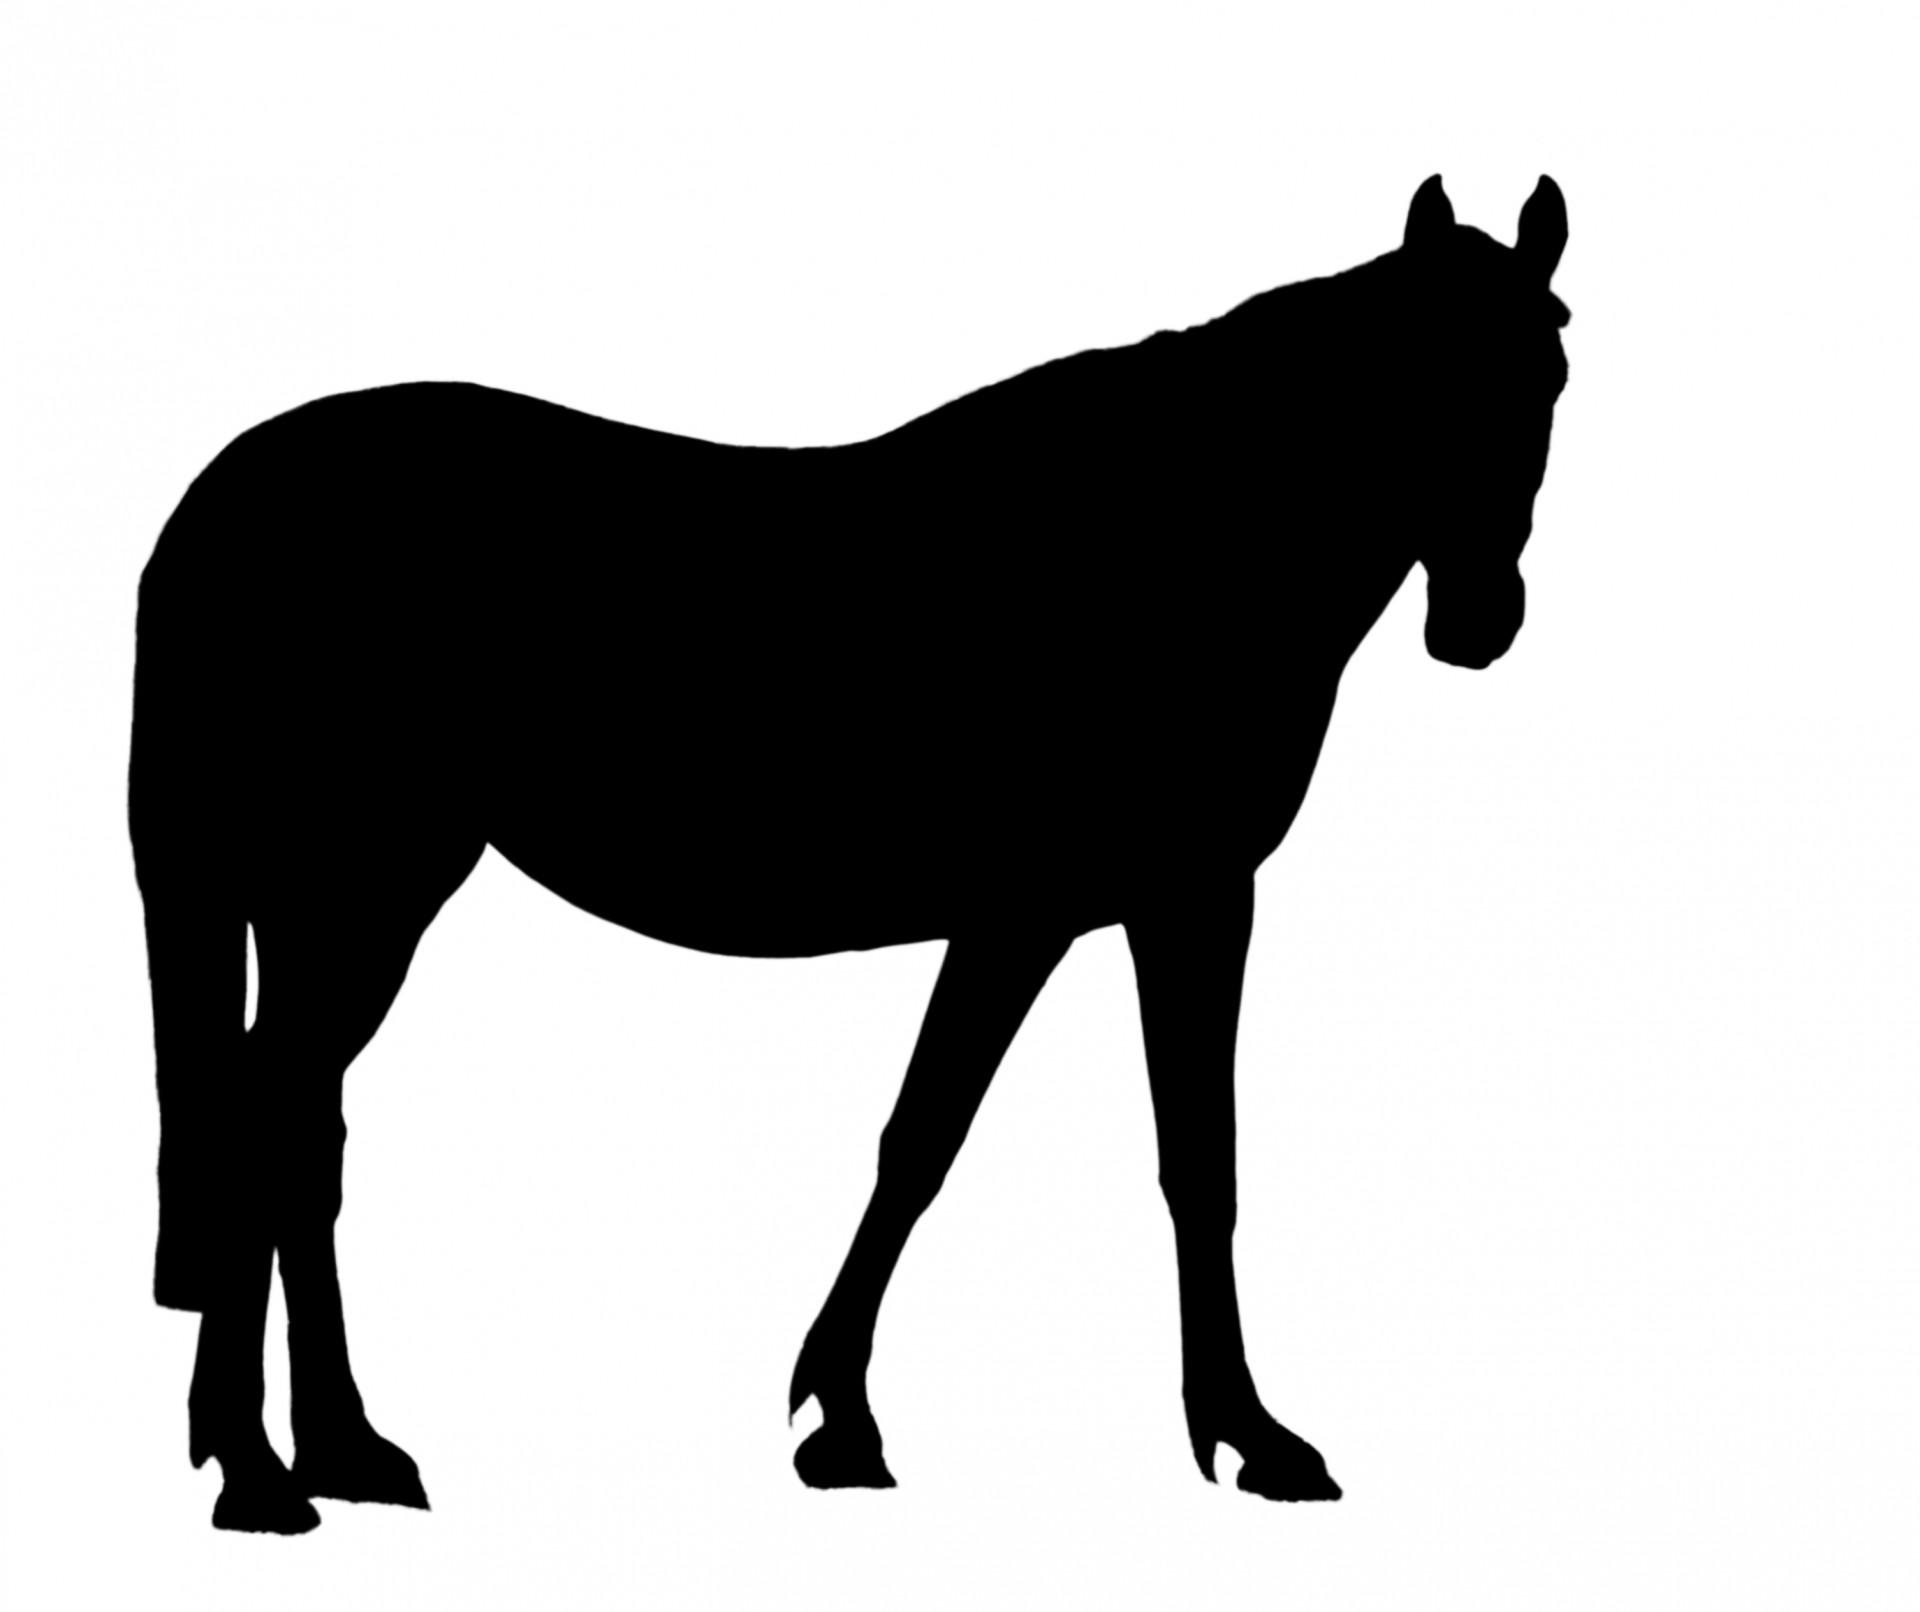 1920x1612 Black Horse Silhouette Clipart Free Stock Photo